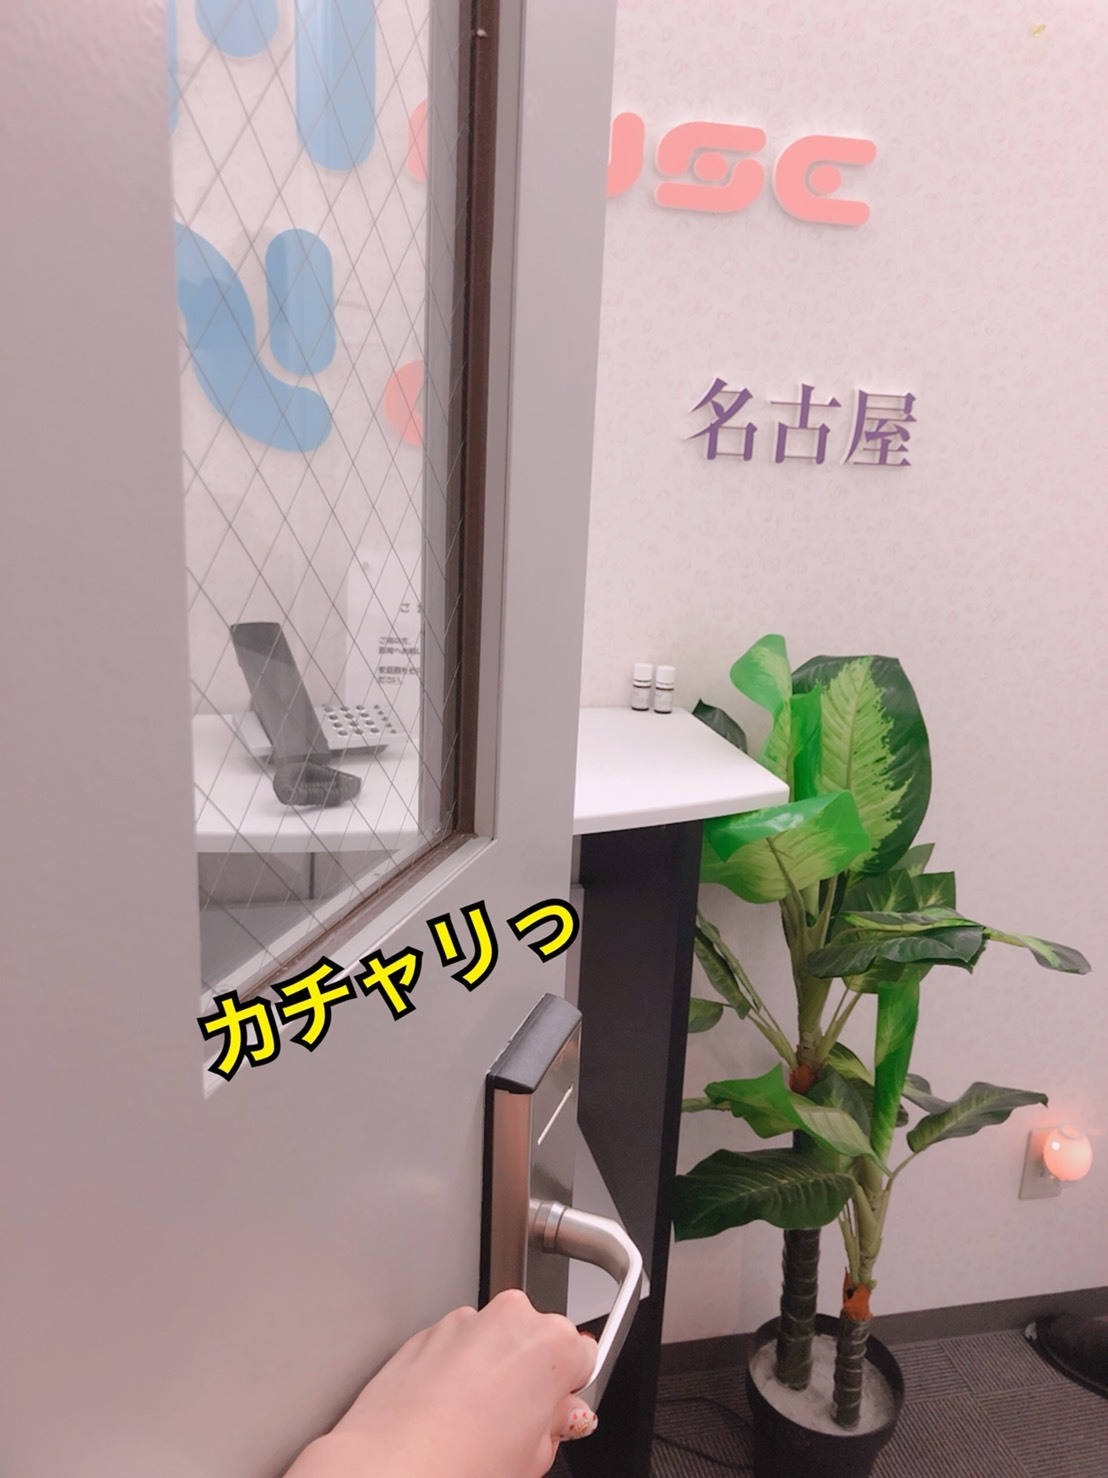 S__14966796.jpg